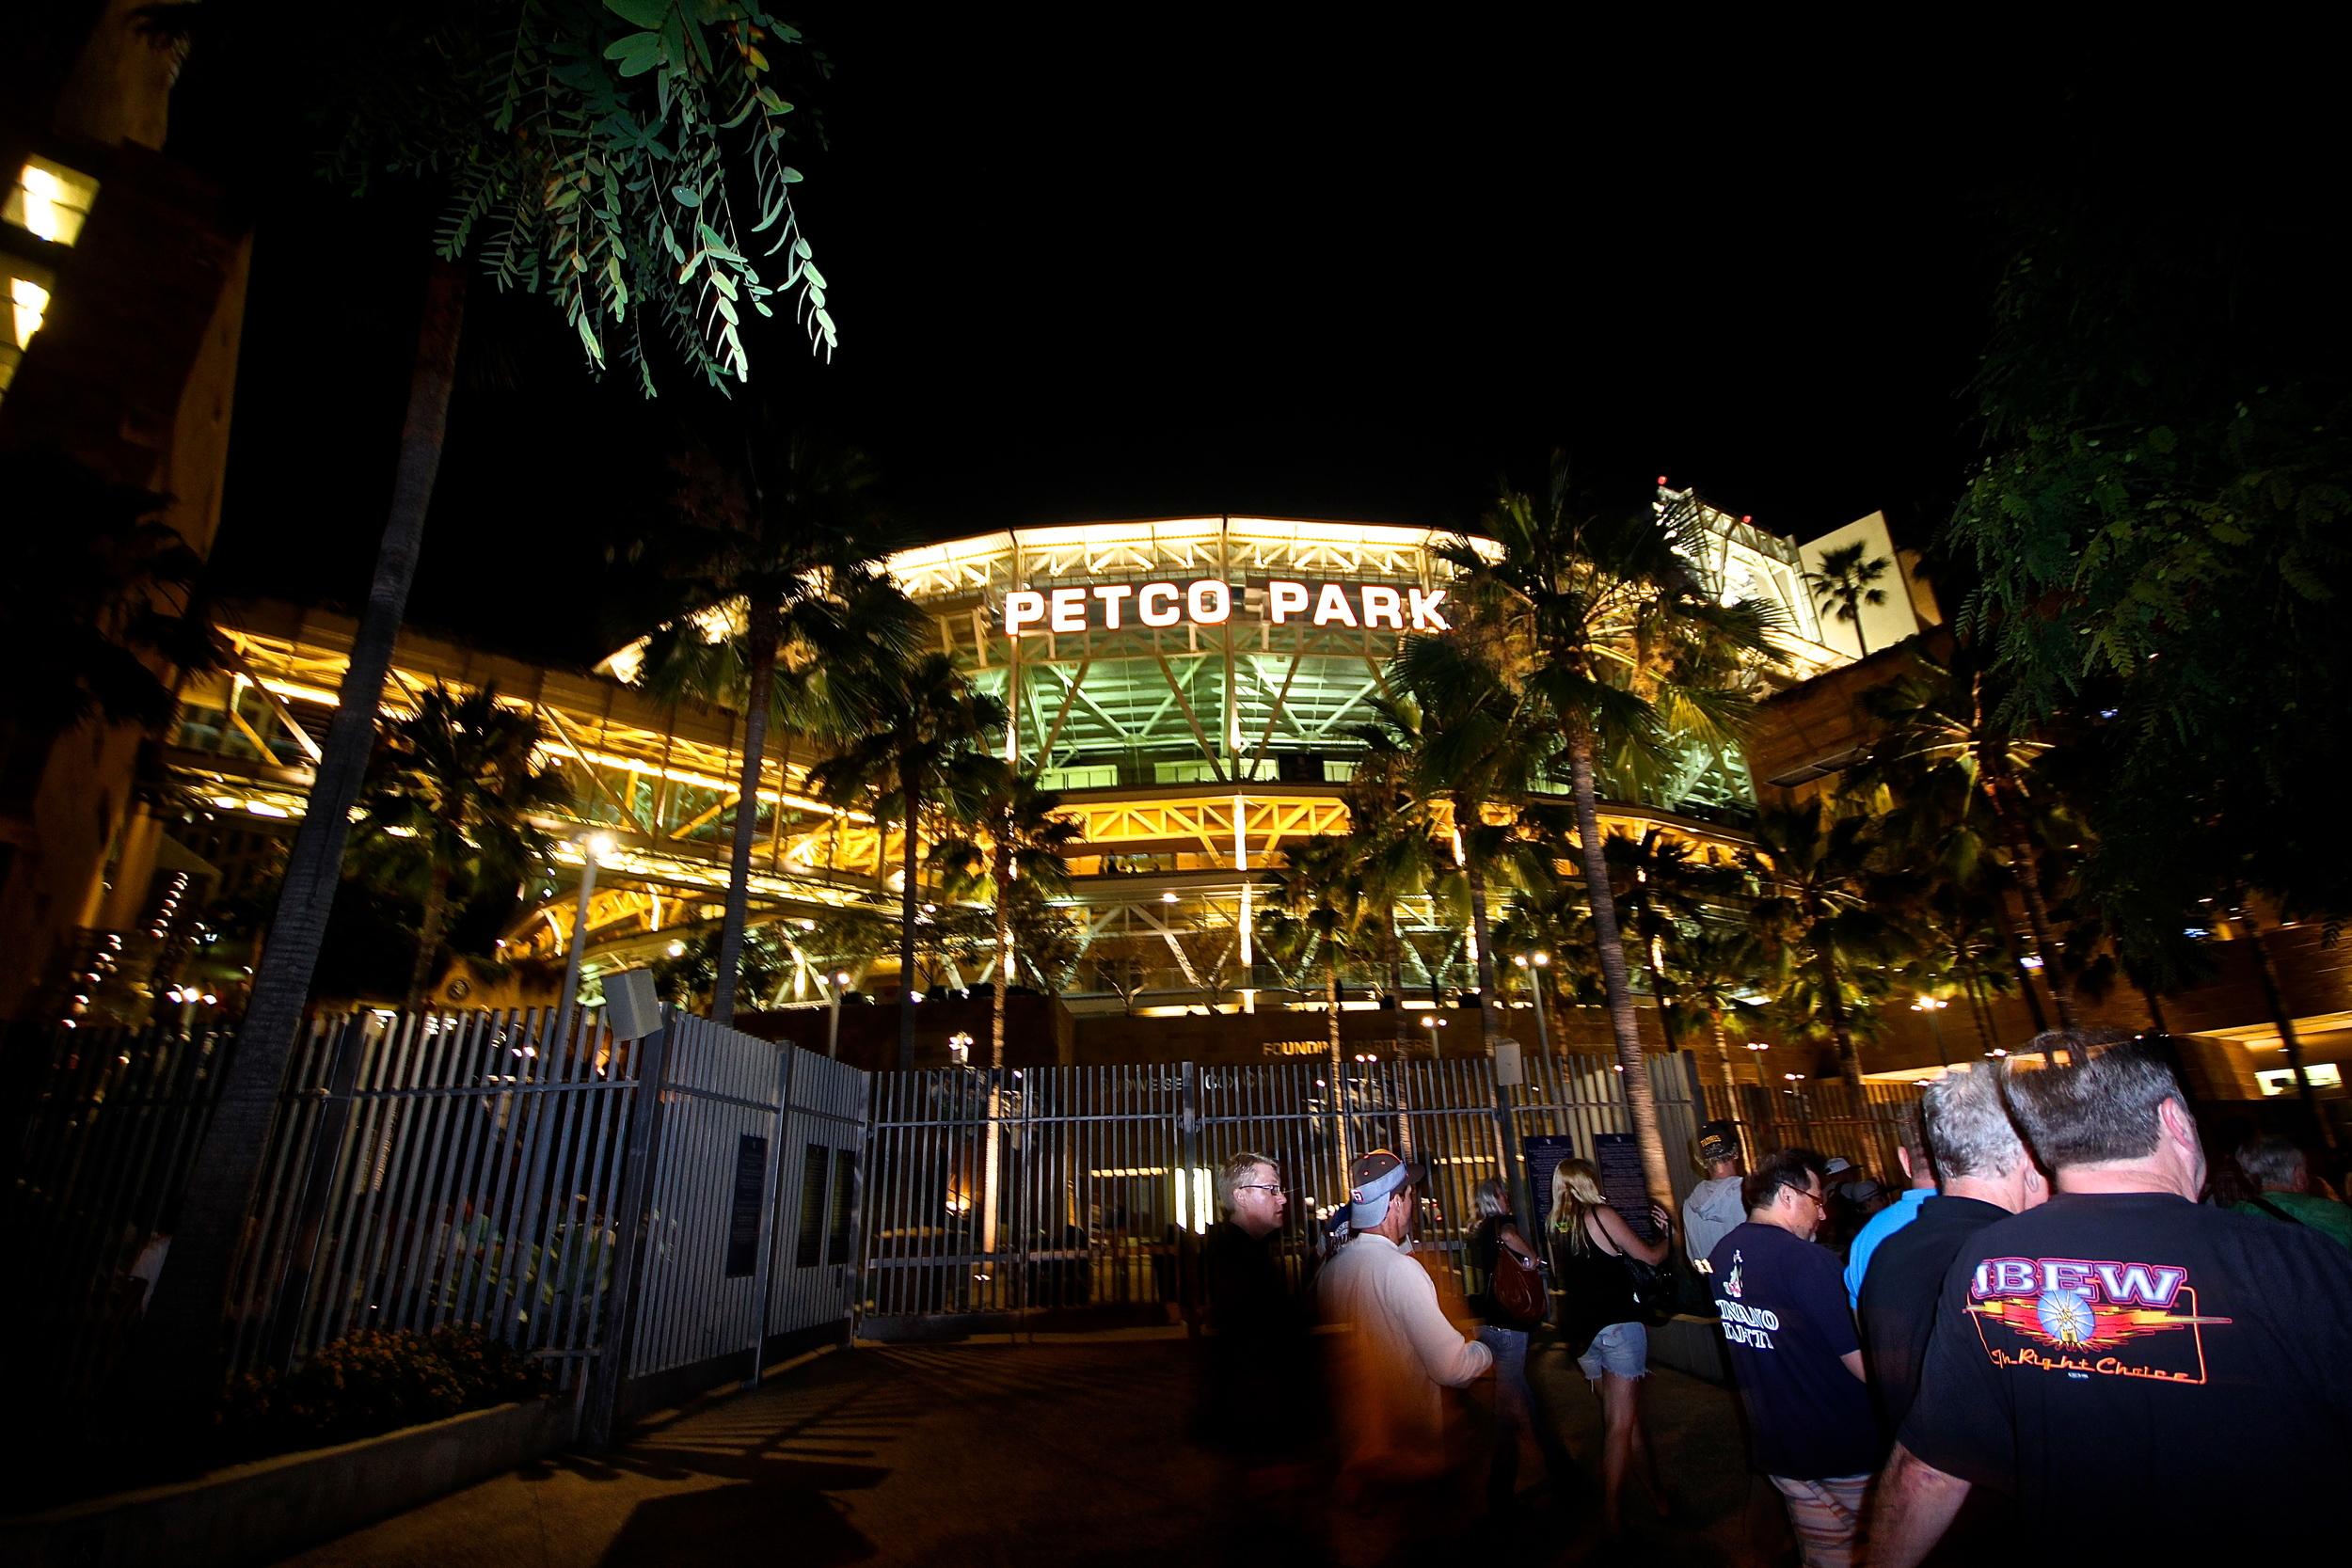 Goodnight Petco Park